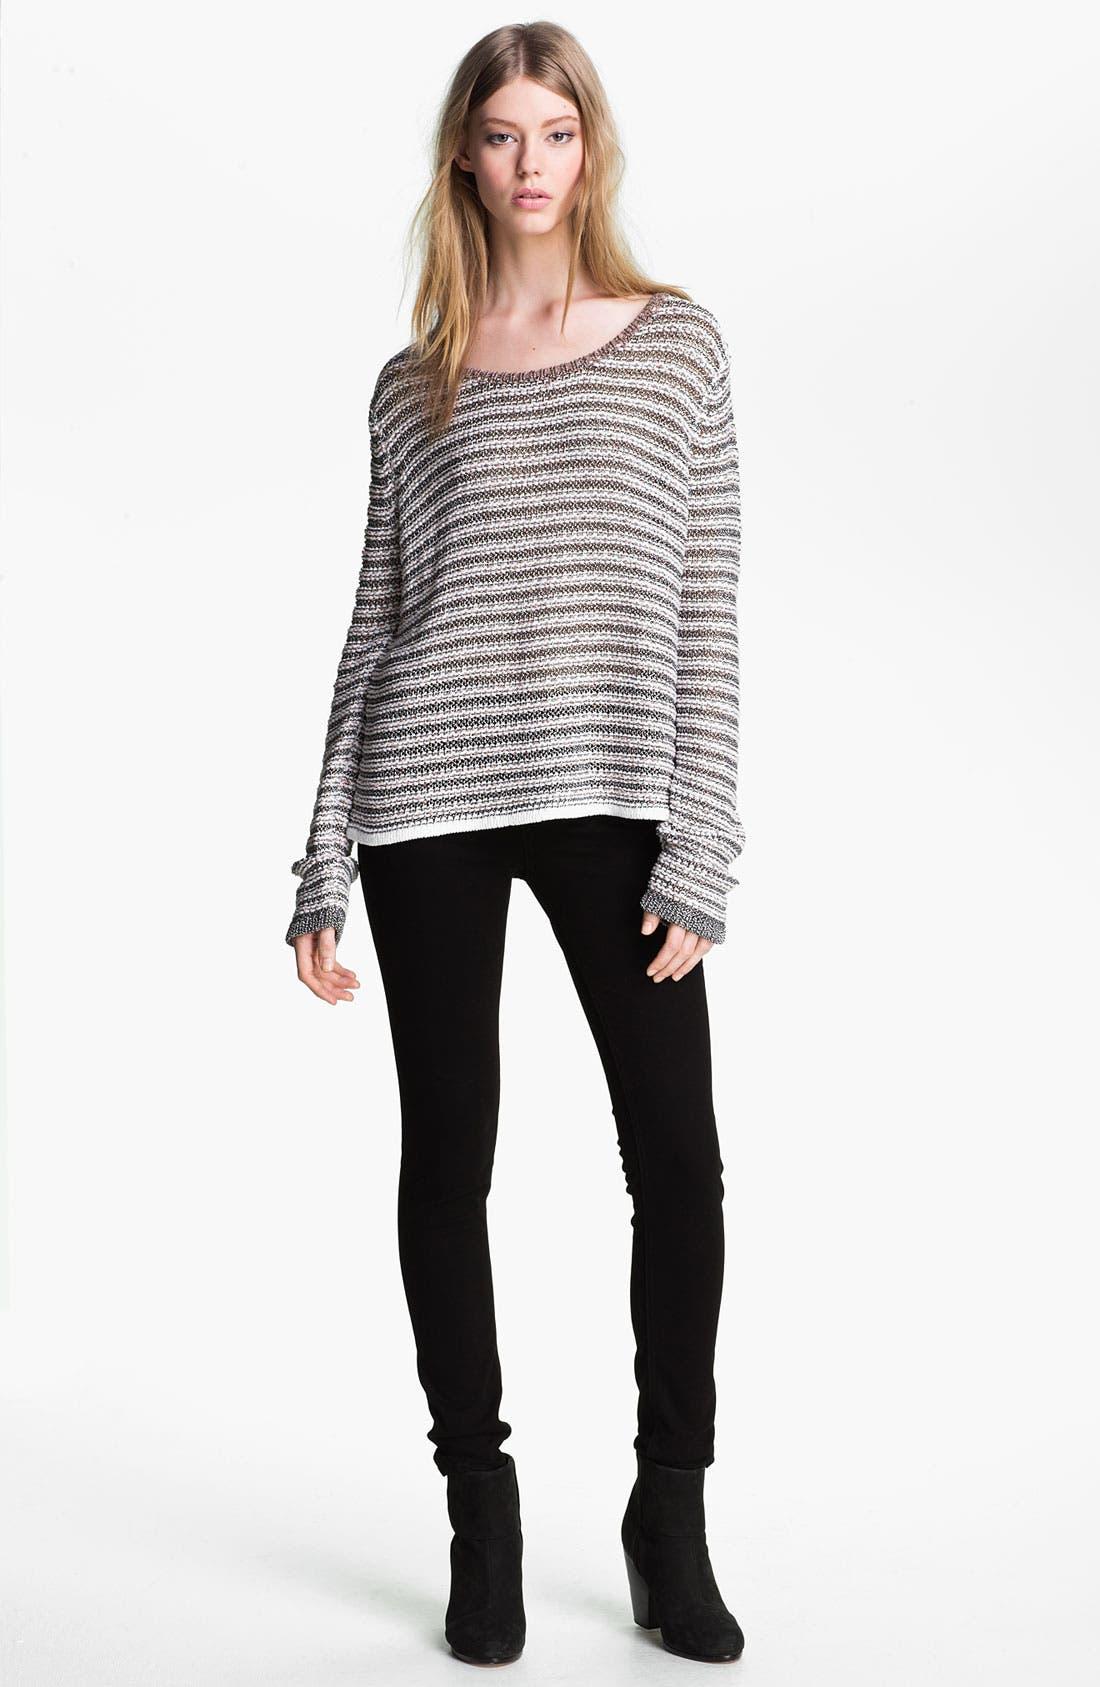 Alternate Image 1 Selected - rag & bone 'Astrid' Pullover